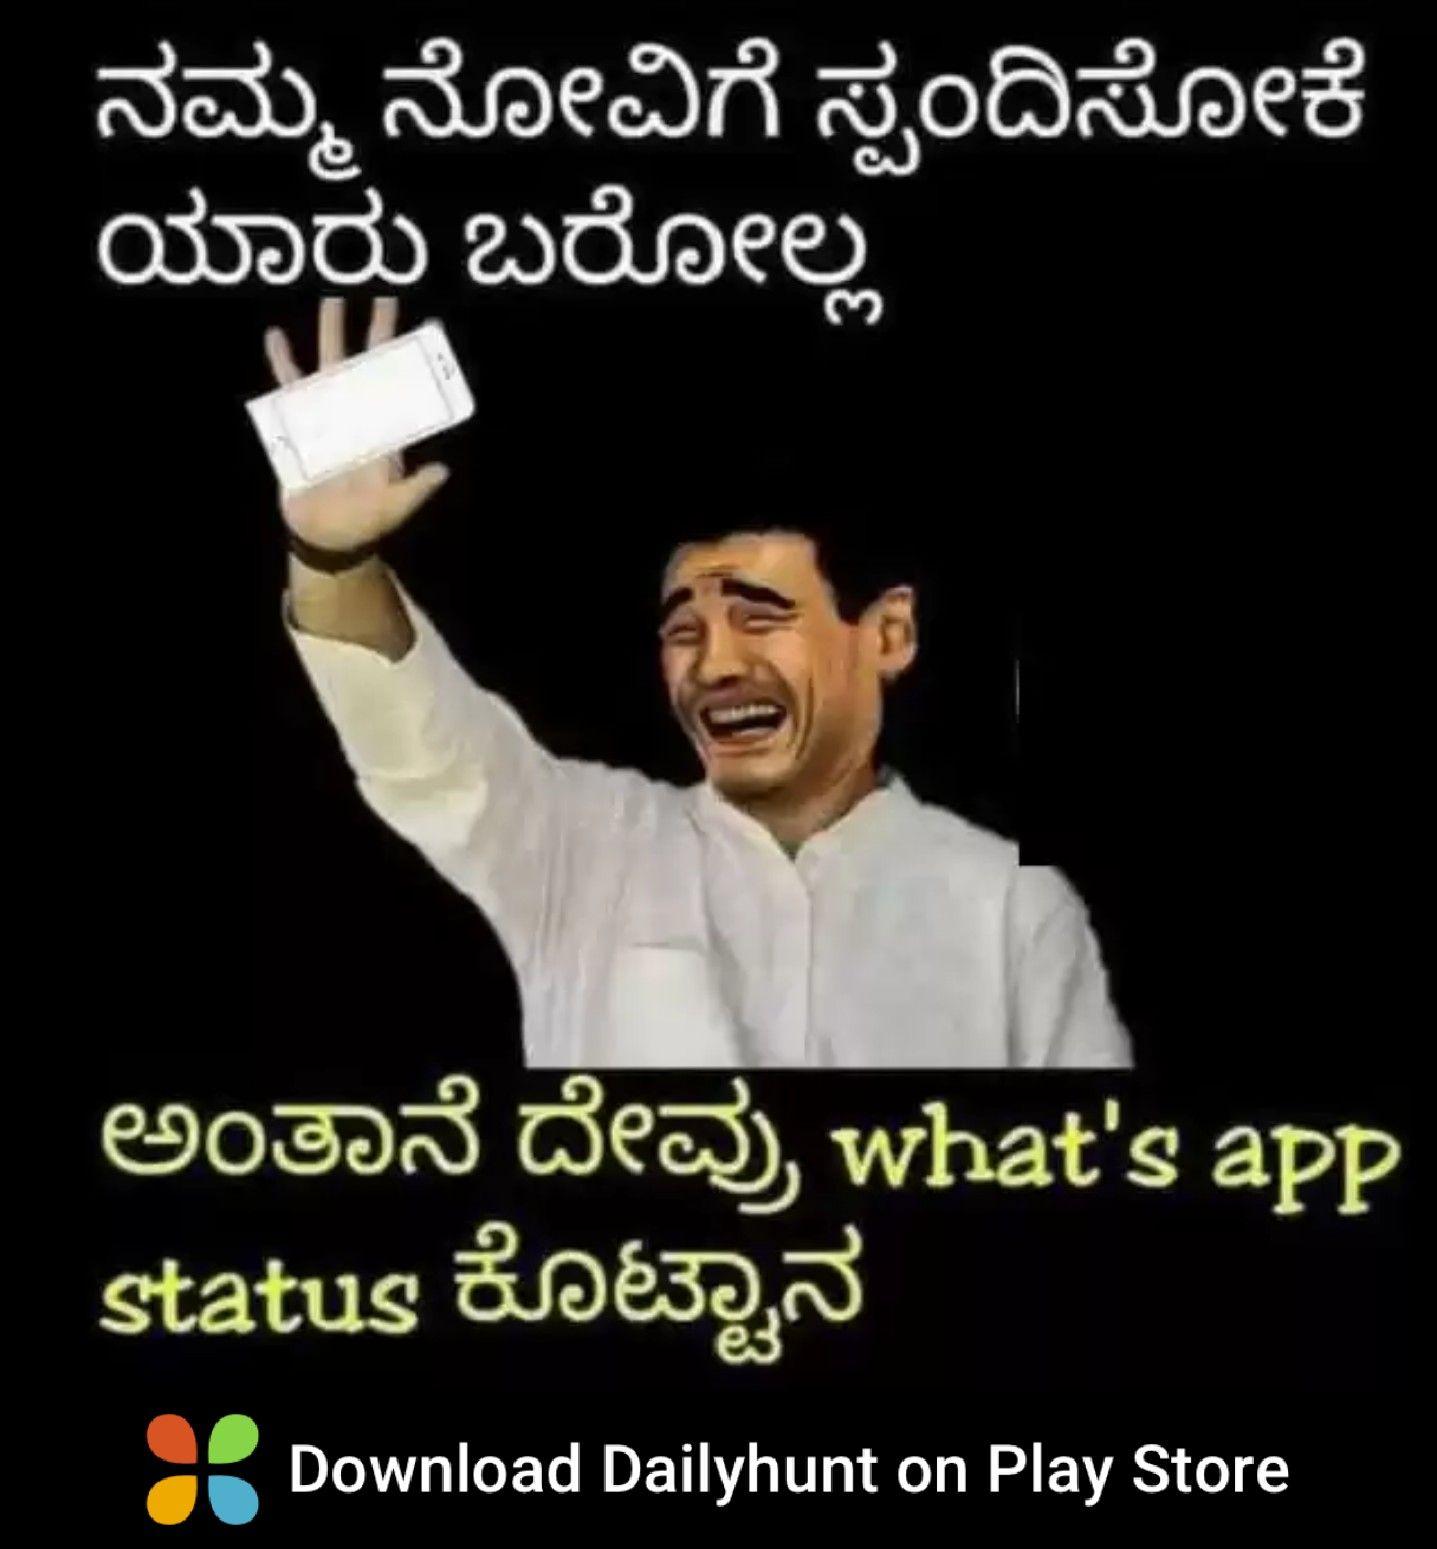 Pin By Kavyasrinivasasn On Daily Hunt Jokes Quotes Funny Quotes Saving Quotes